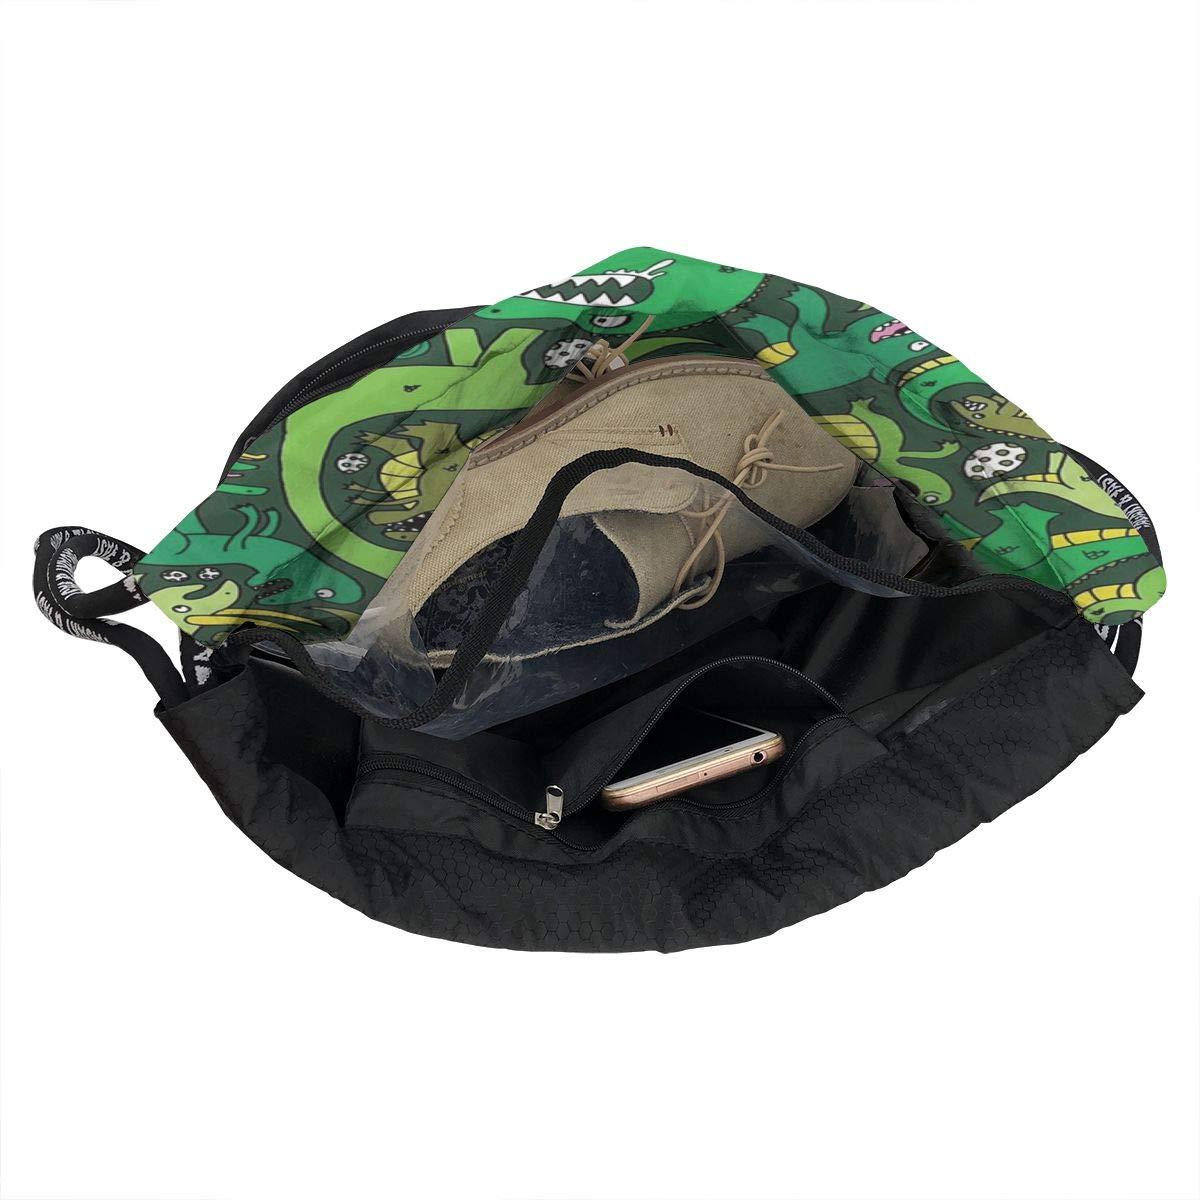 HUOPR5Q Lovely Green Dinosaurs Drawstring Backpack Sport Gym Sack Shoulder Bulk Bag Dance Bag for School Travel